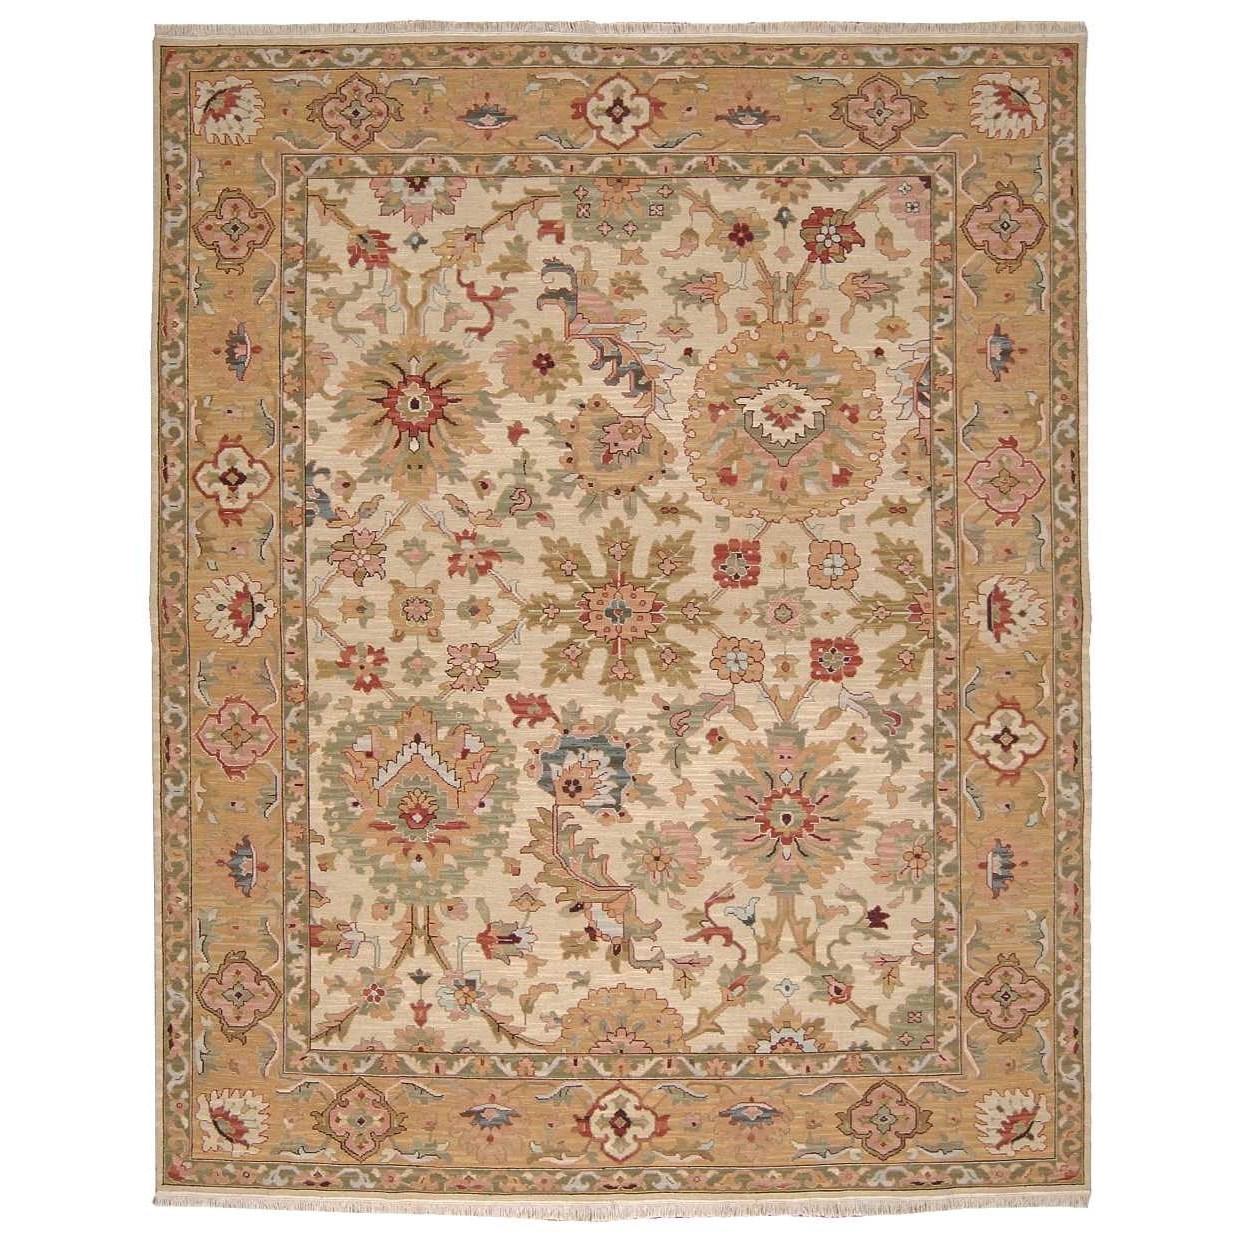 9 X 12 Nourison Nourmak Hand Knotted 100 Wool Persian: Nourison Nourmak S174 BGE 12X15 12' X 15' Beige Rectangle